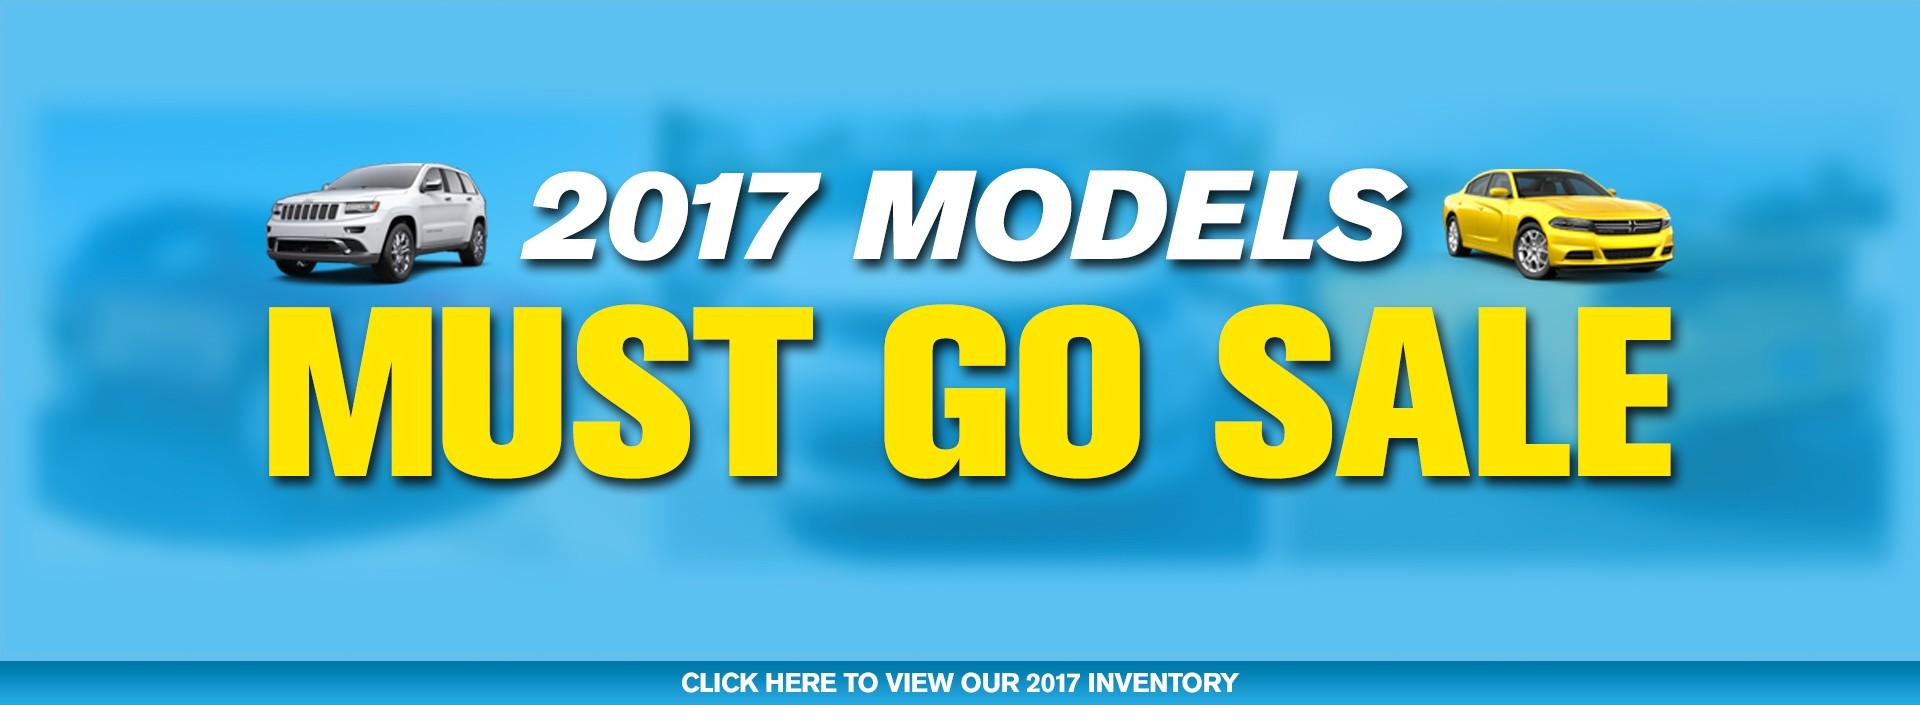 2017 Models Must Go